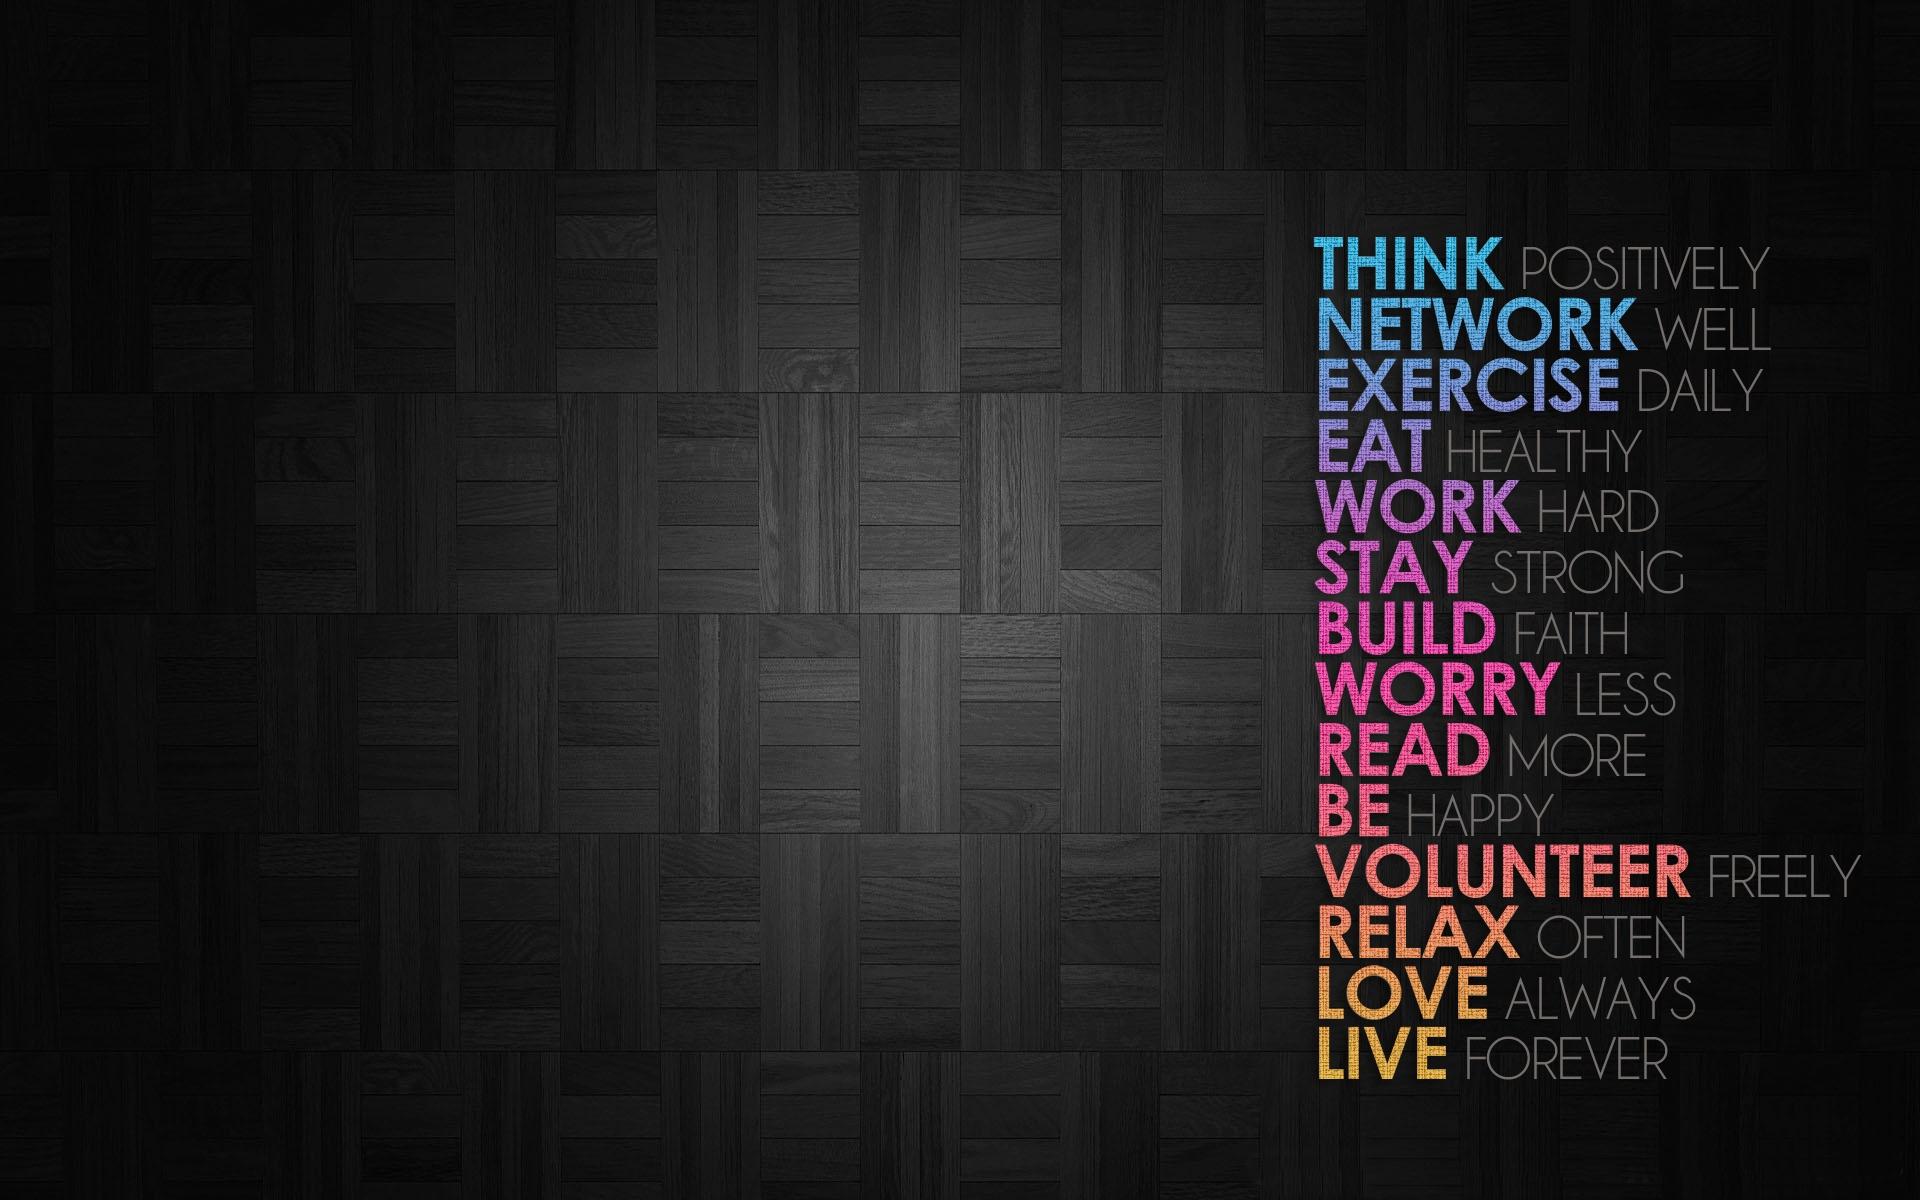 Quotes hd Wallpaper | High Quality Wallpapers,Wallpaper Desktop,High ...